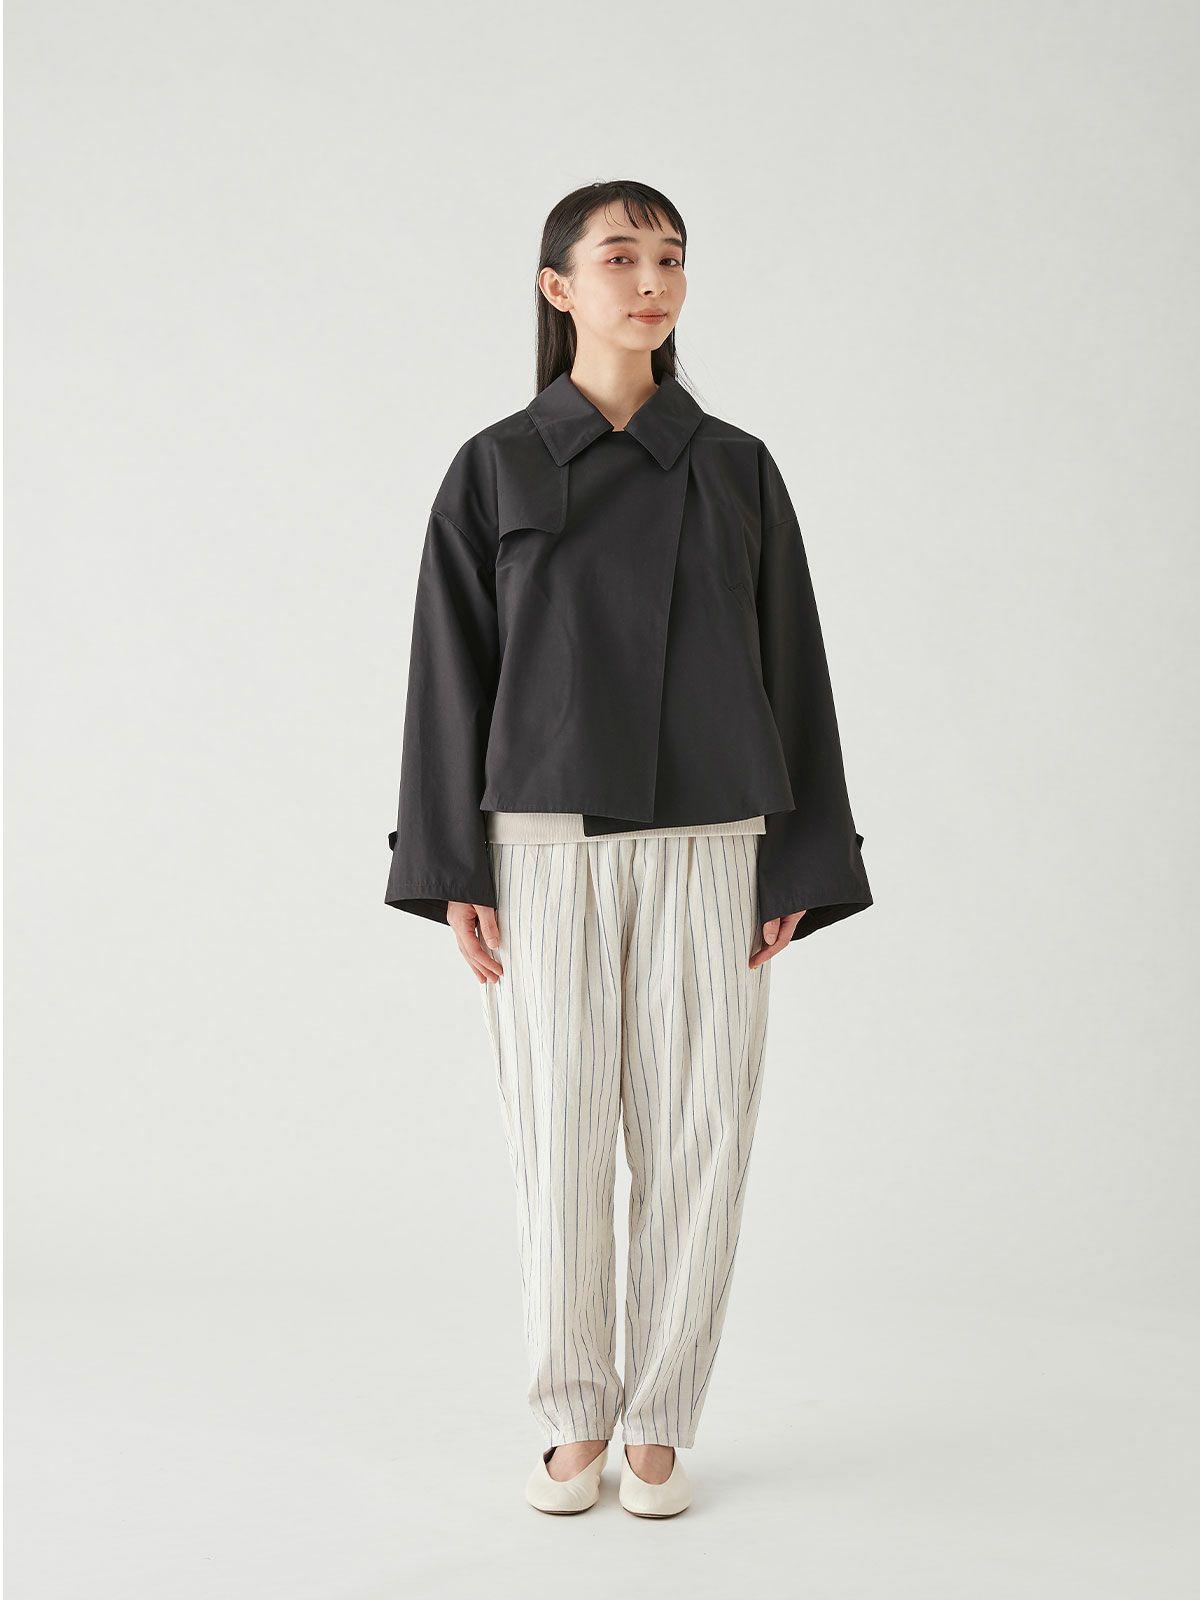 short trench coat / black